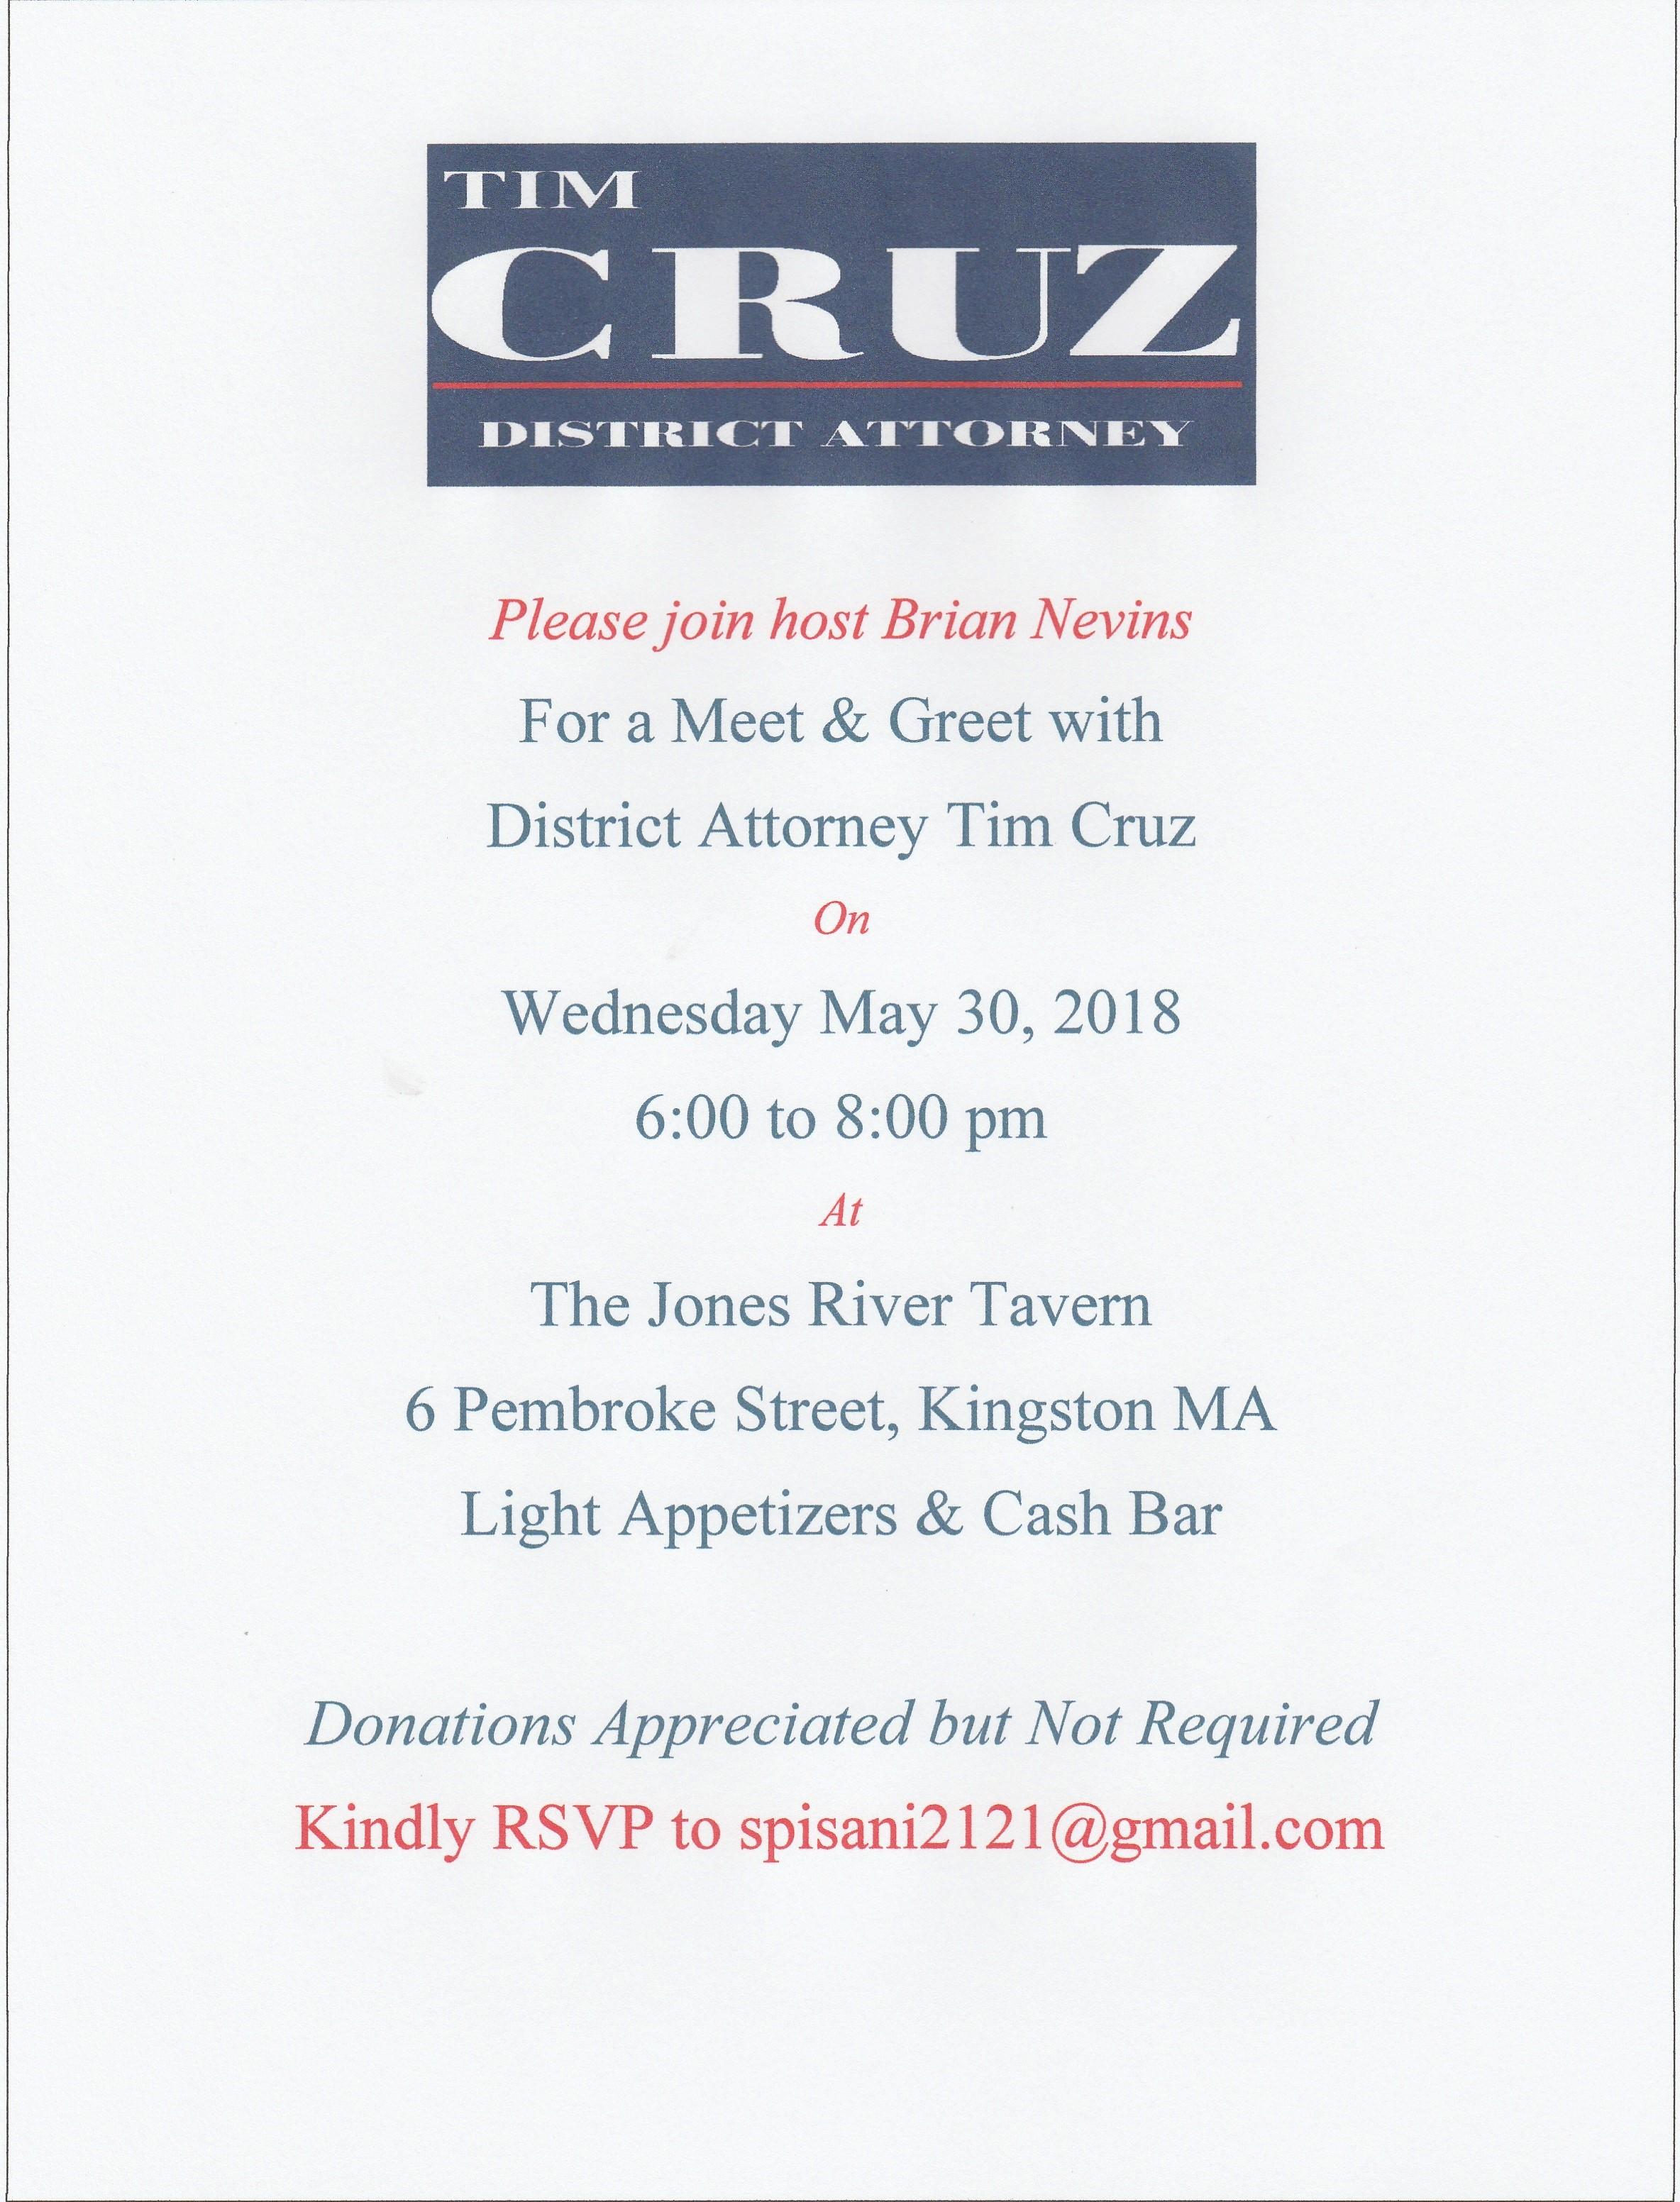 Meet and Greet Invite